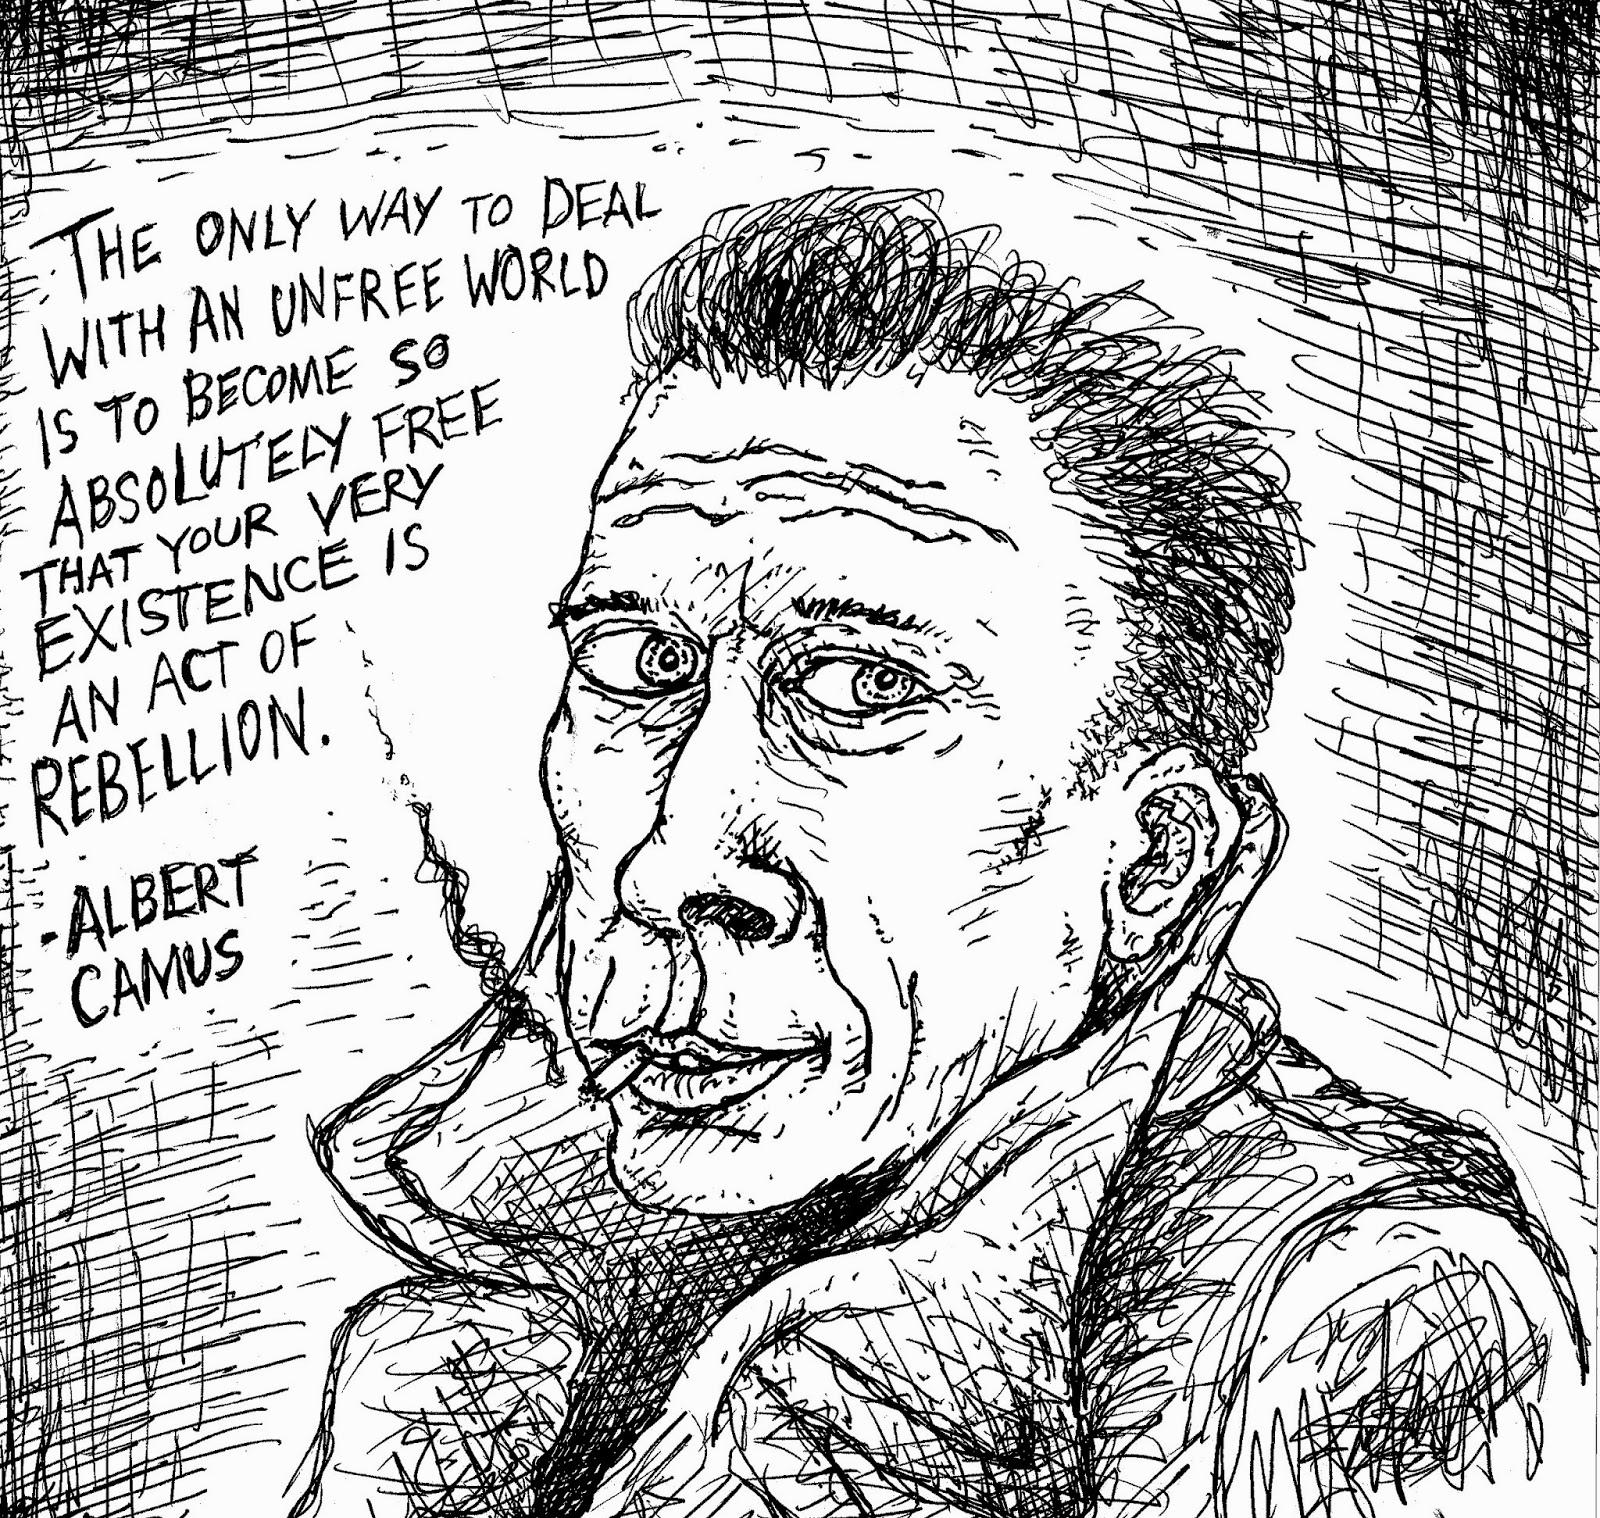 essay on the stranger an anime journey a comparison of characters  biographies ii albert camus interpretation of mersault in camus the stranger by robert champigny 1969 albert descriptive essay